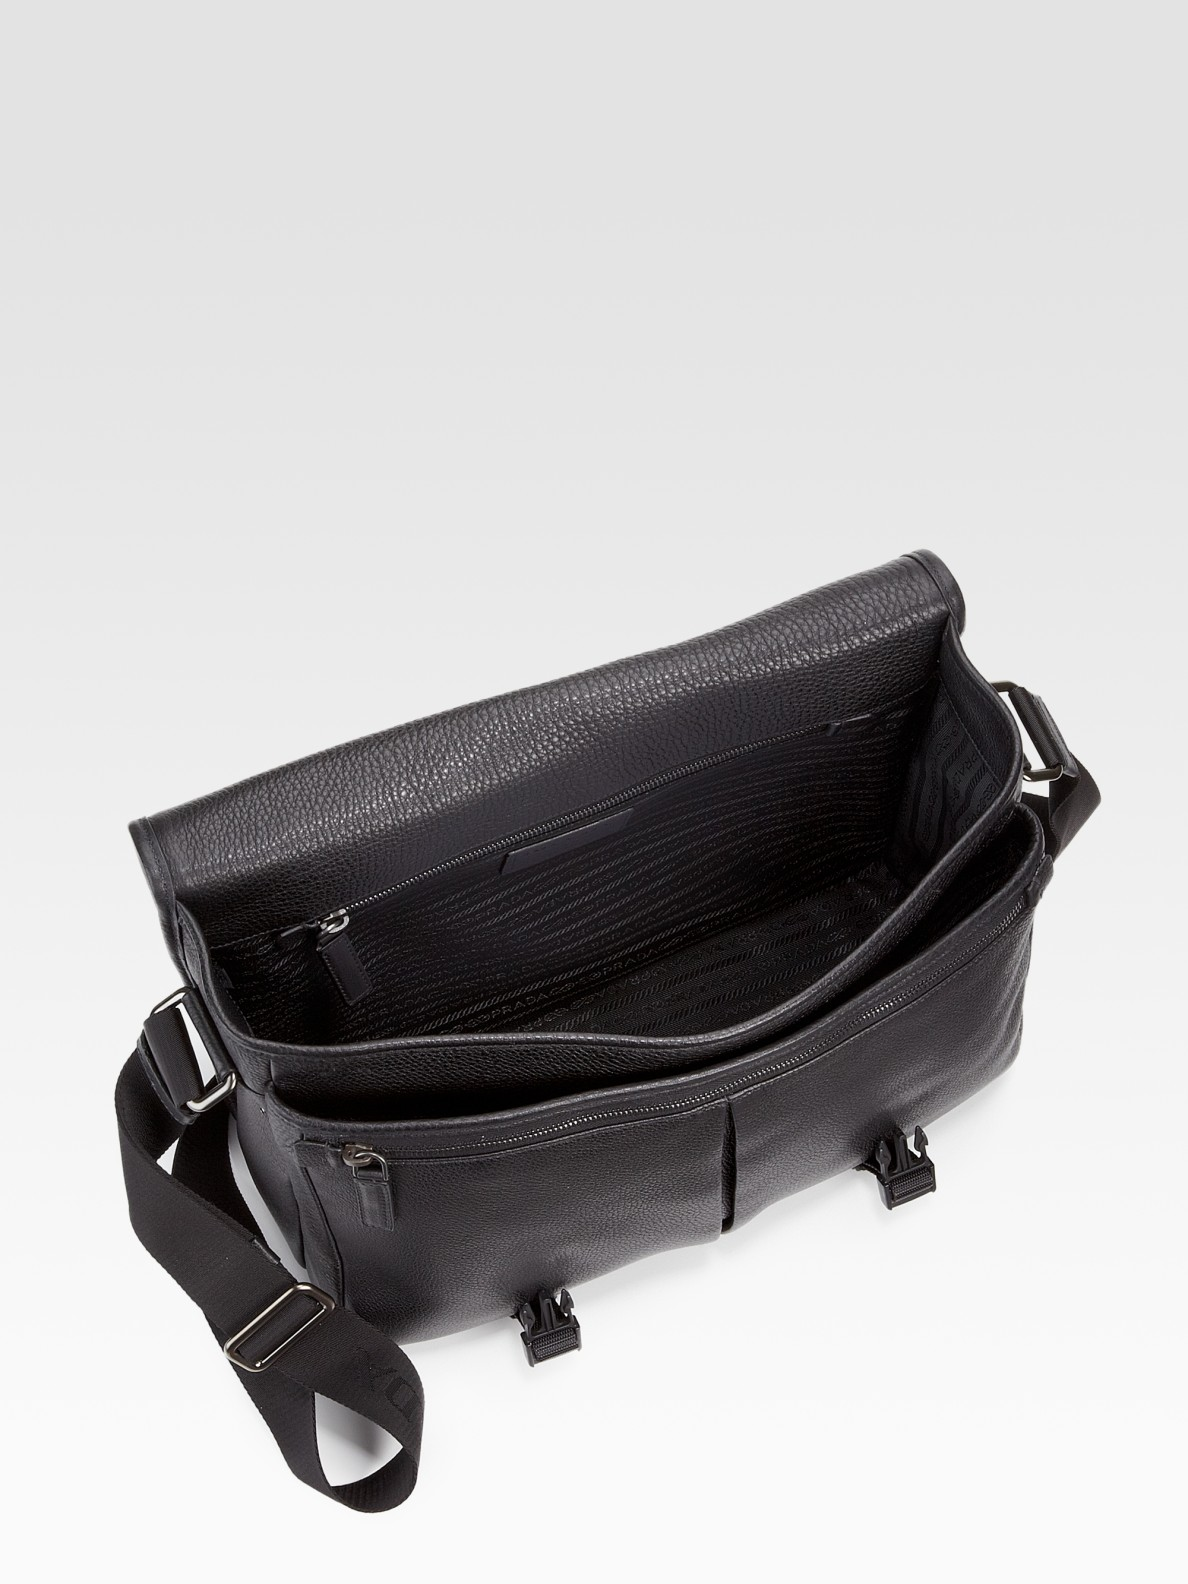 prada leather messenger bag